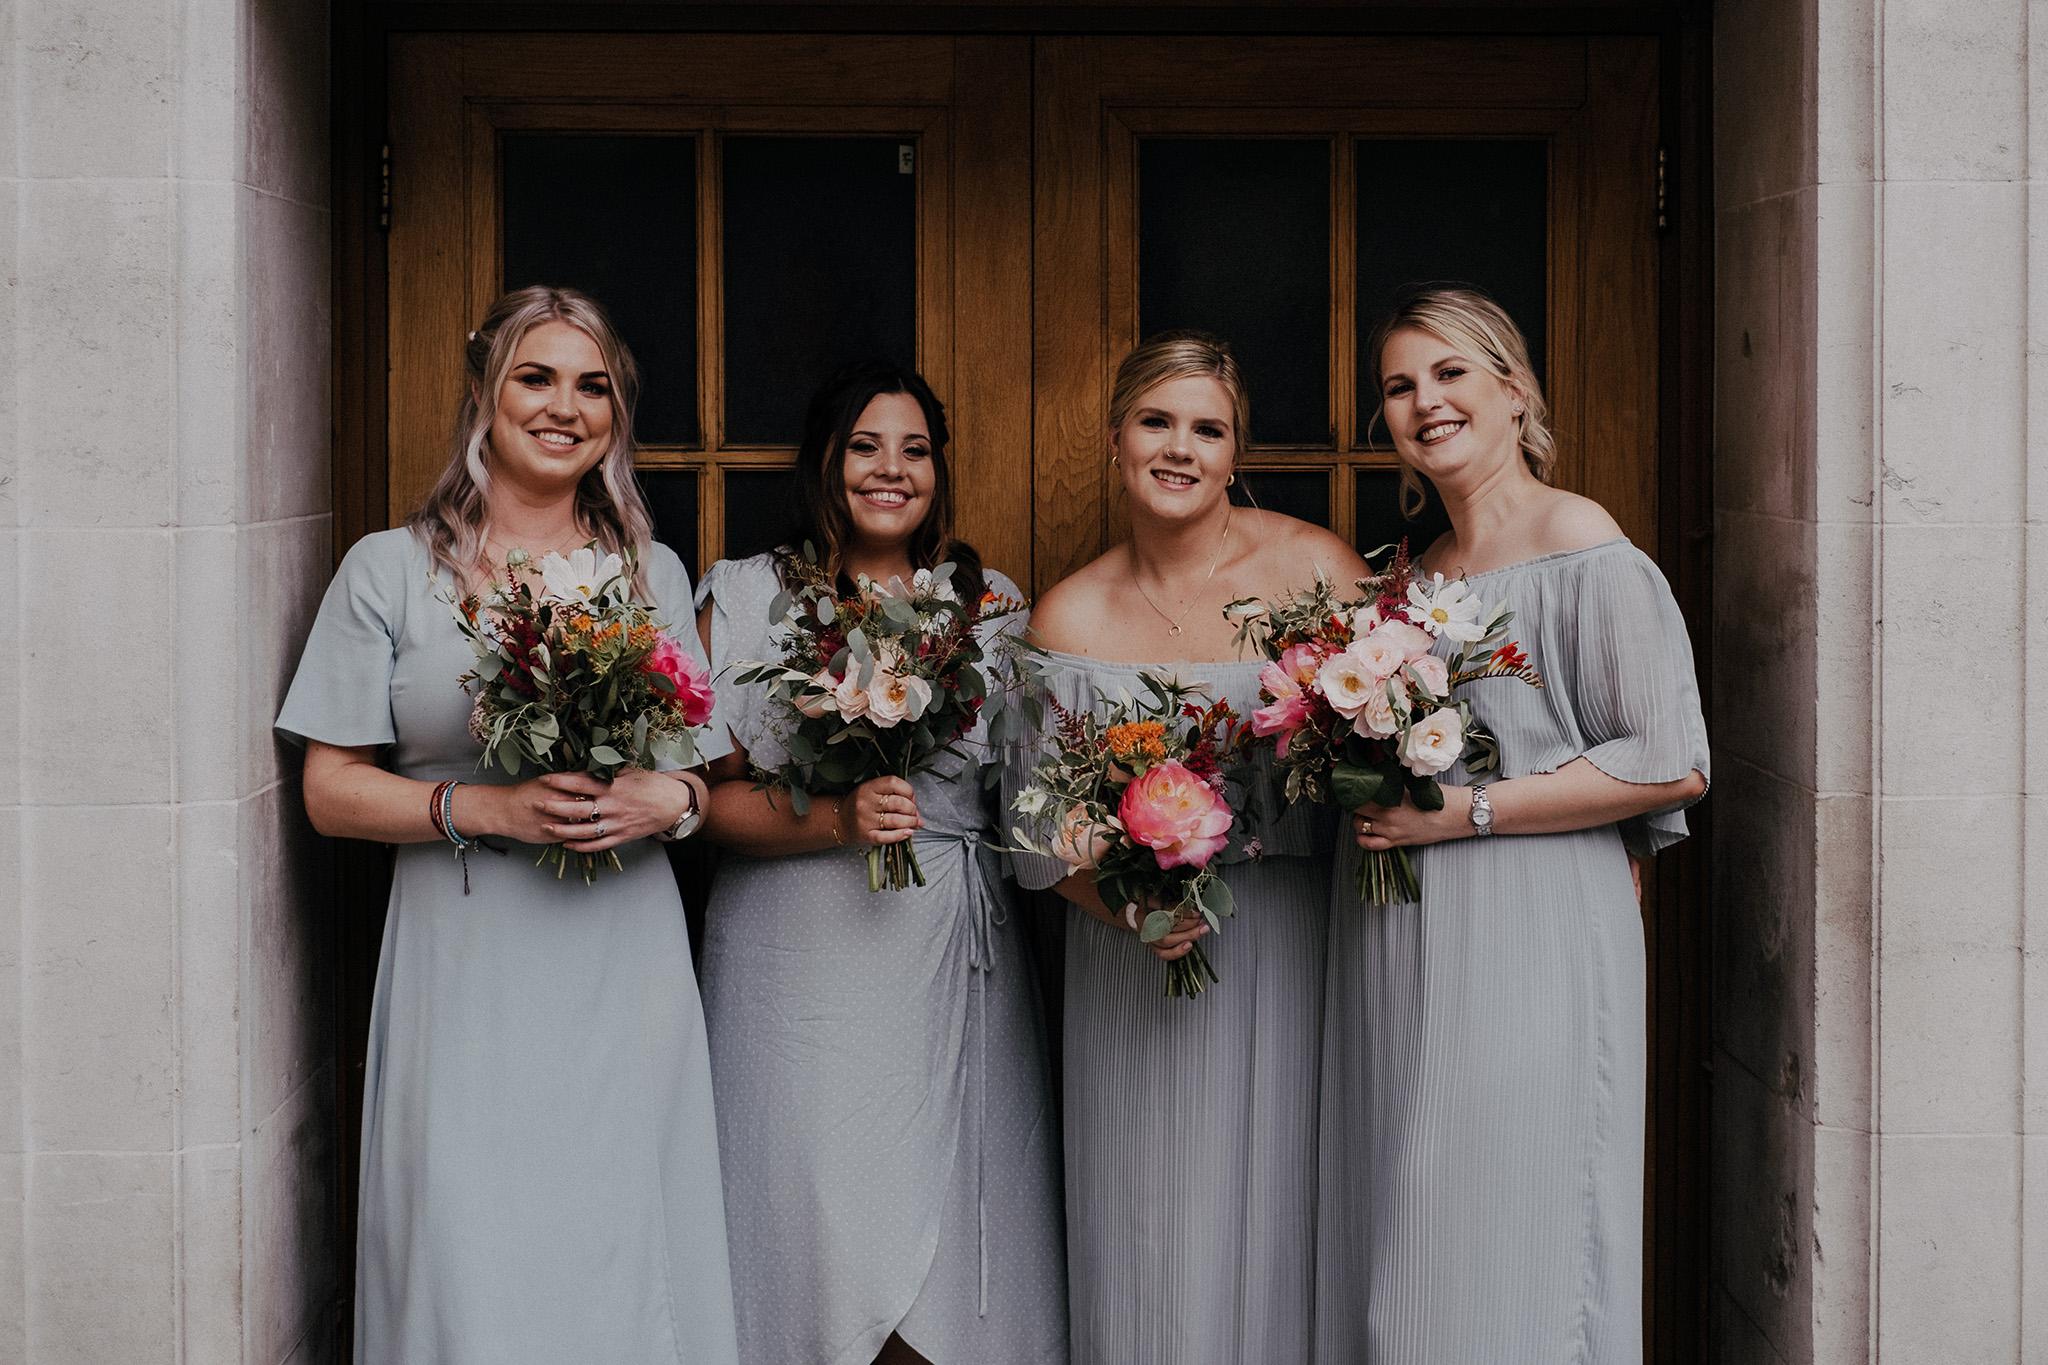 Islington-town-hall-wedding12.jpg